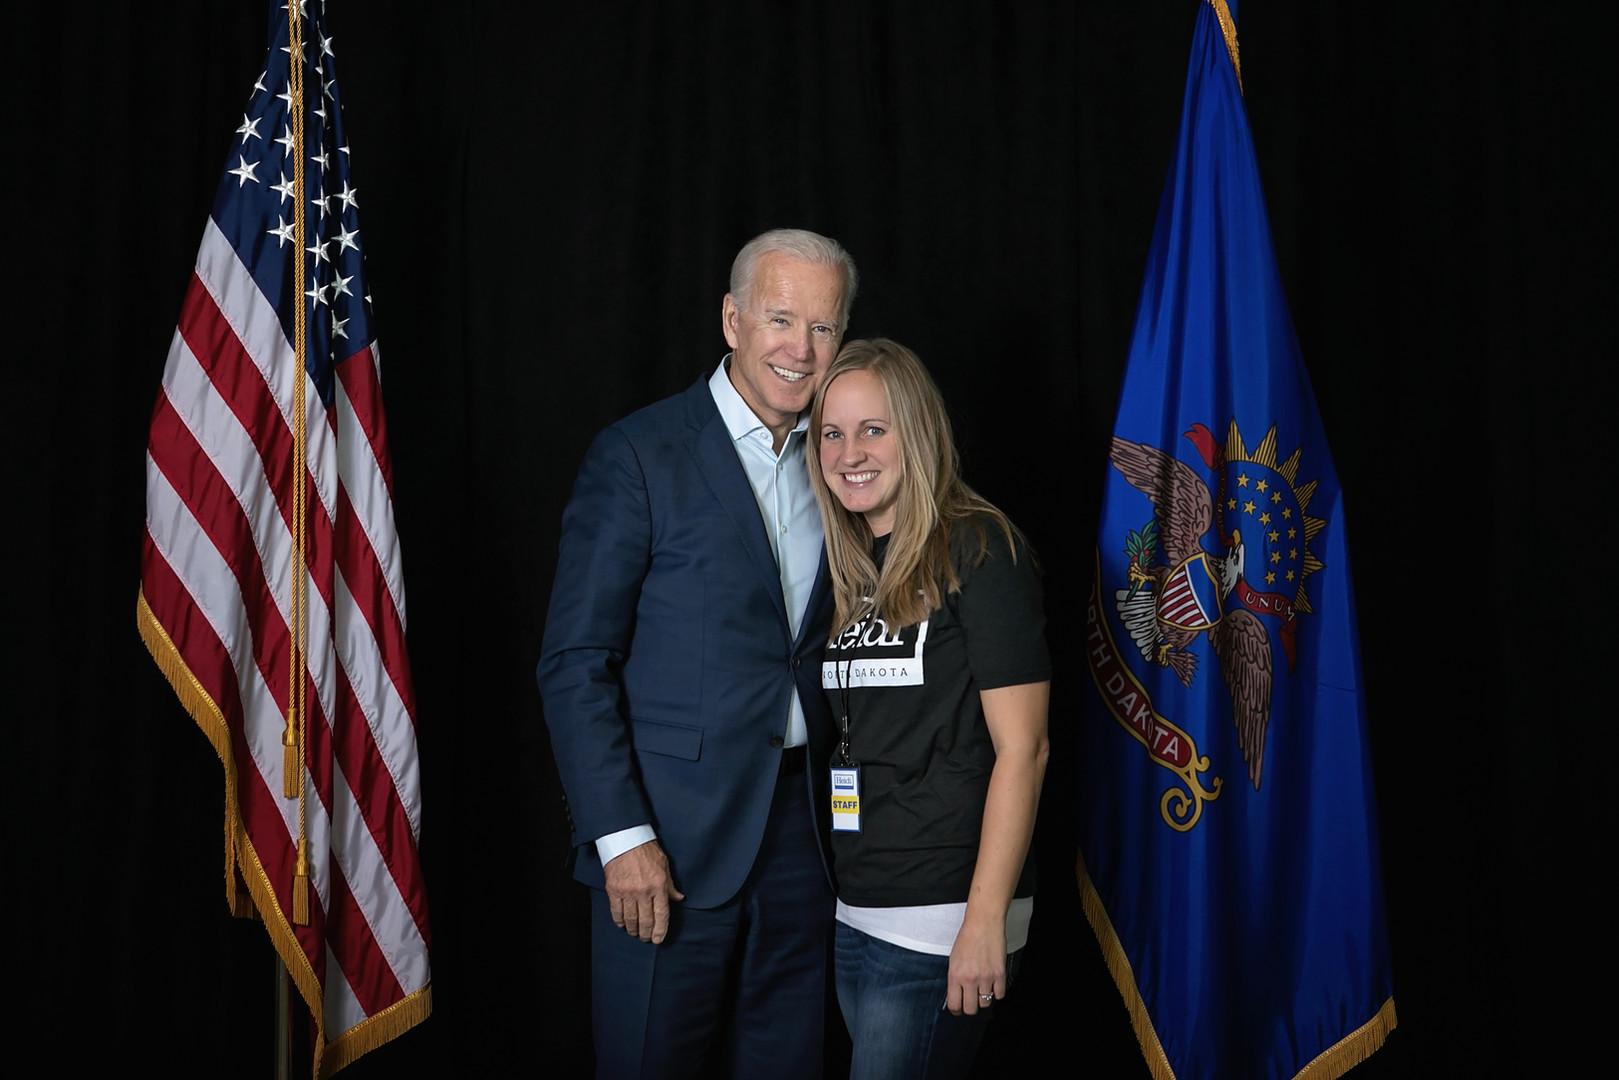 Kari with Joe Biden in 2018